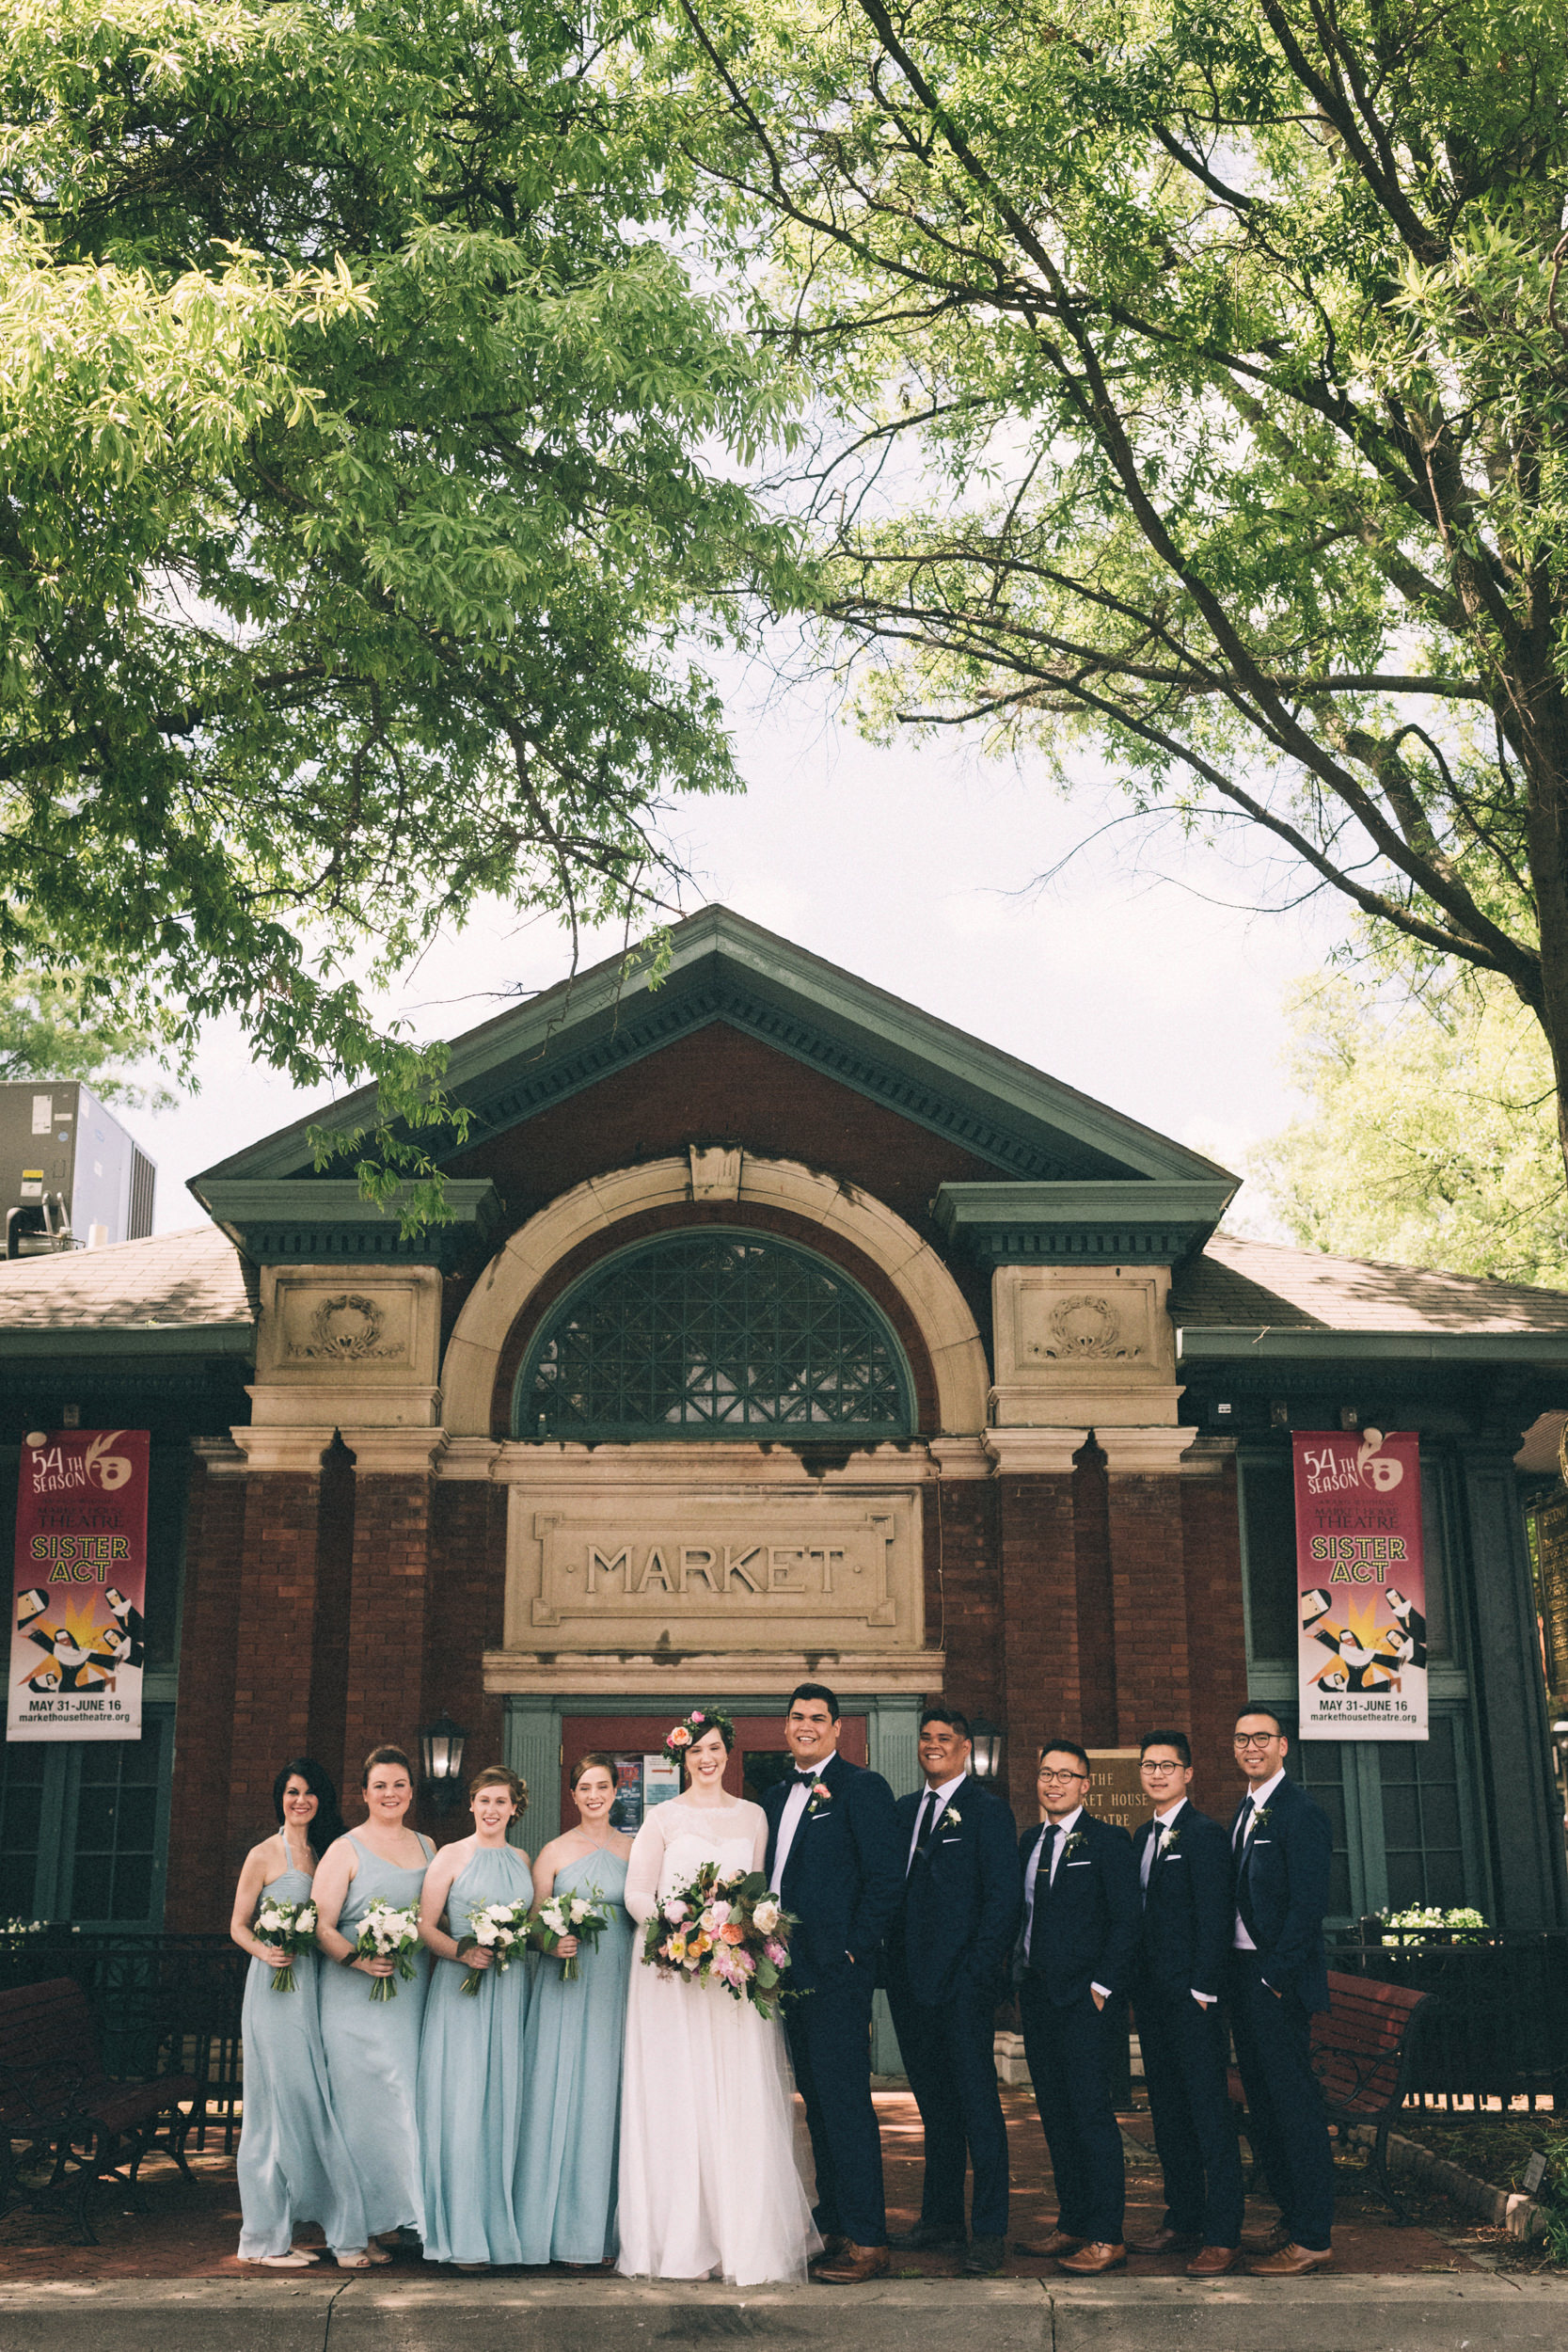 lauren-dean-wedding-grand-lodge-kentucky-sarah-katherine-davis-photography-223edit.jpg